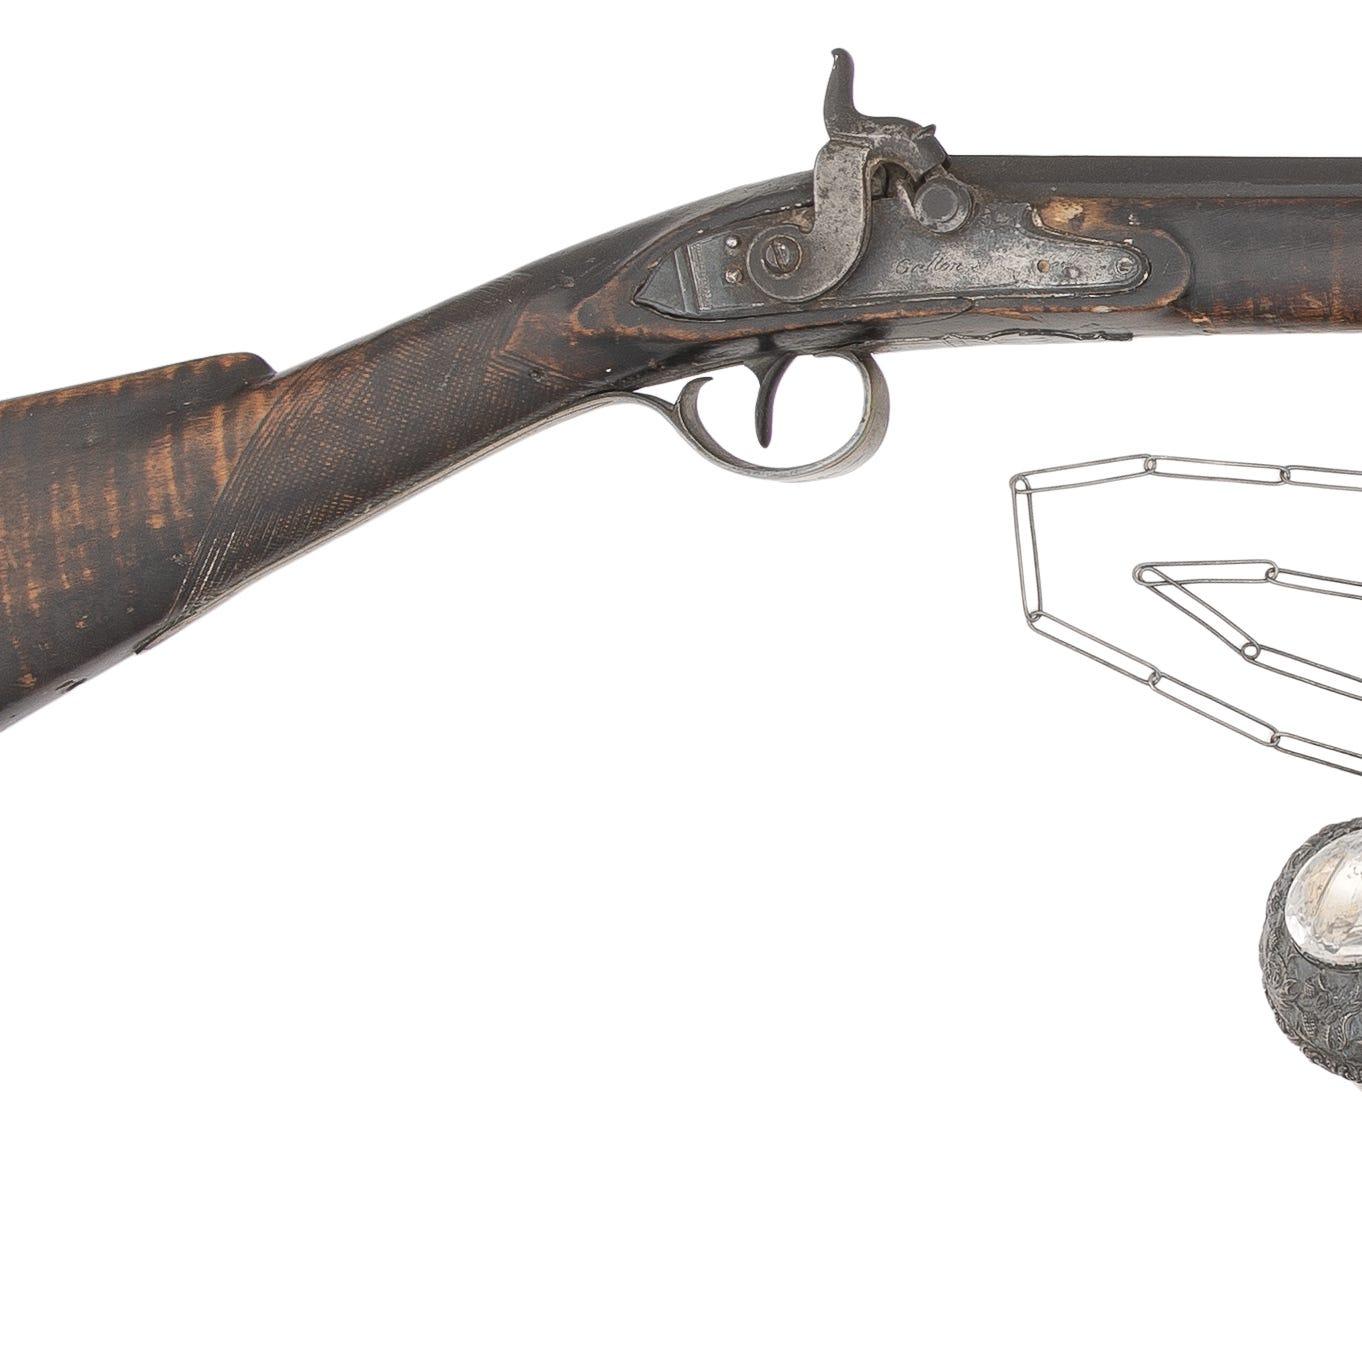 Audubon rifle sells for $192,000